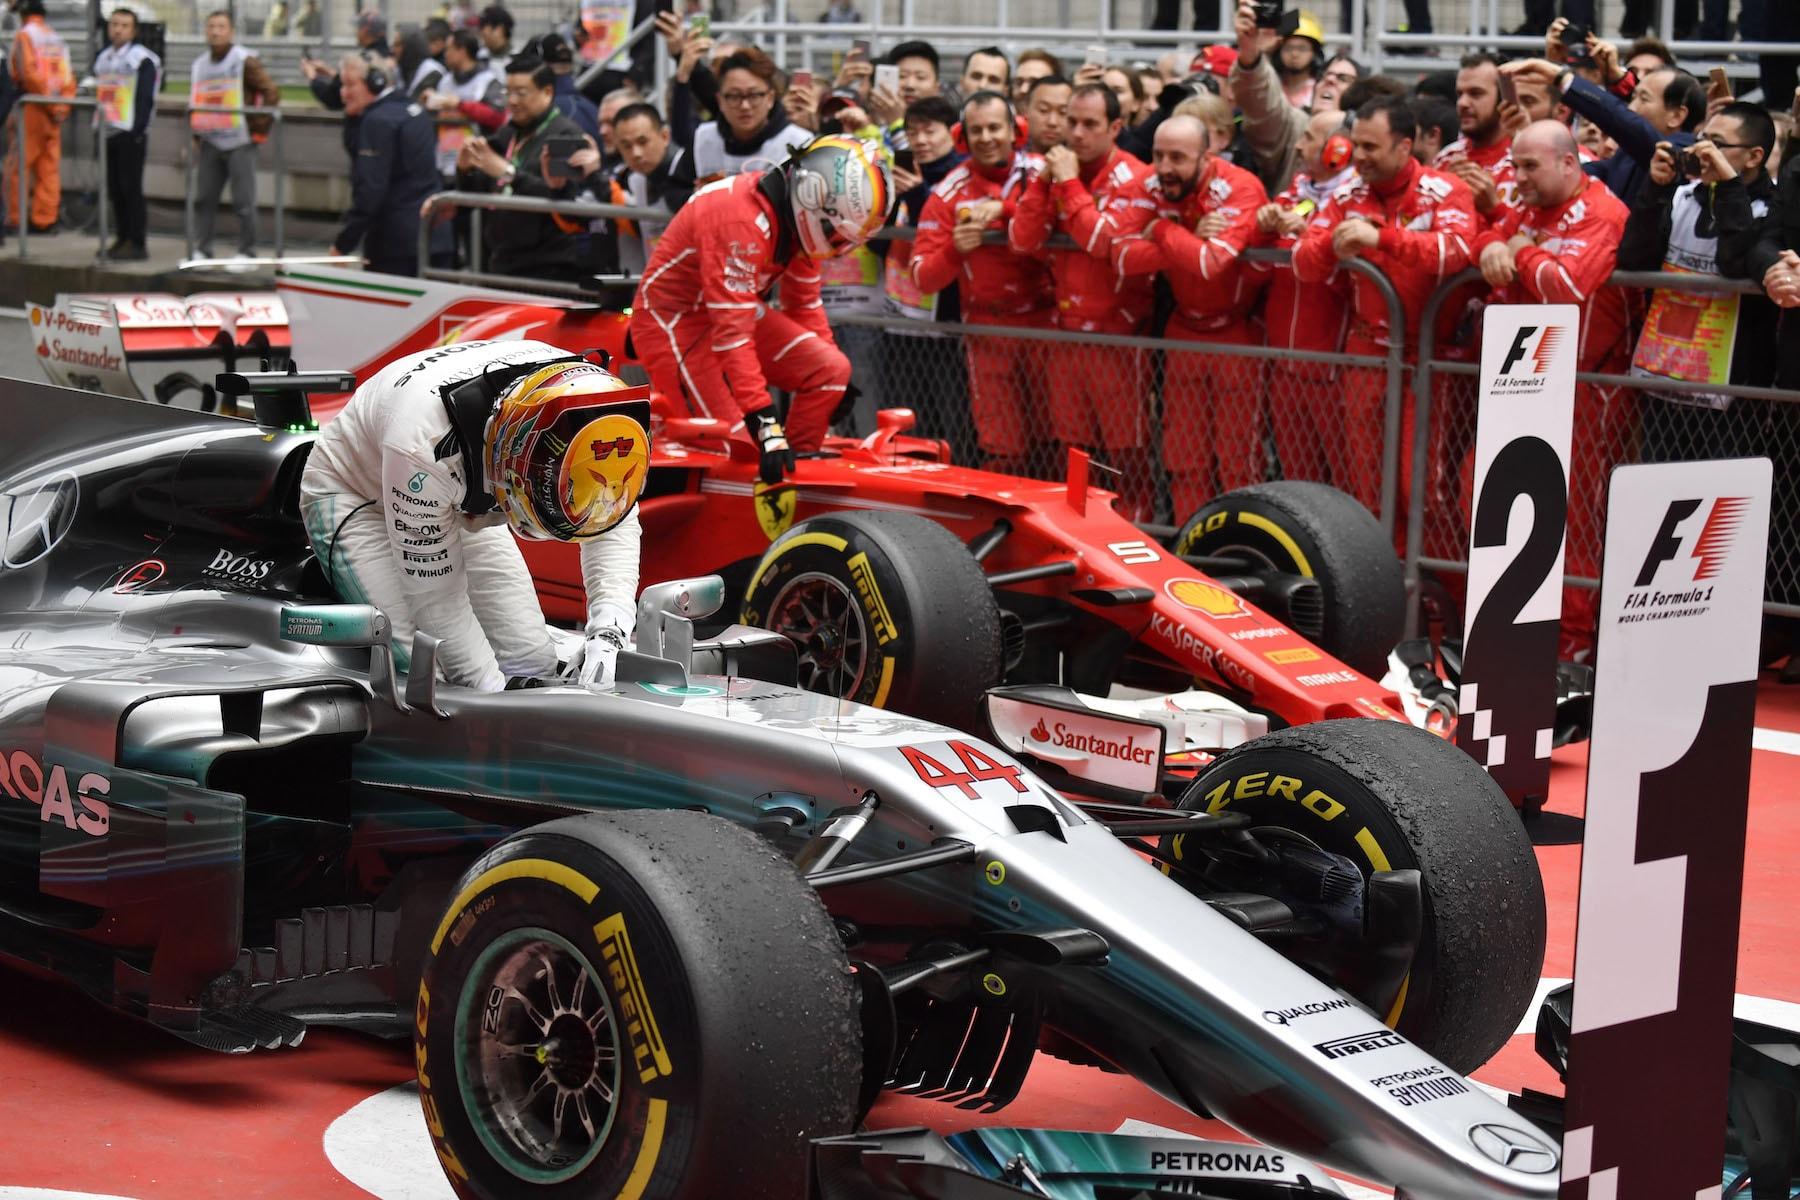 T 2017 Lewis Hamilton | Mercedes W08 | 2017 Chinese GP Winner 7 copy.JPG